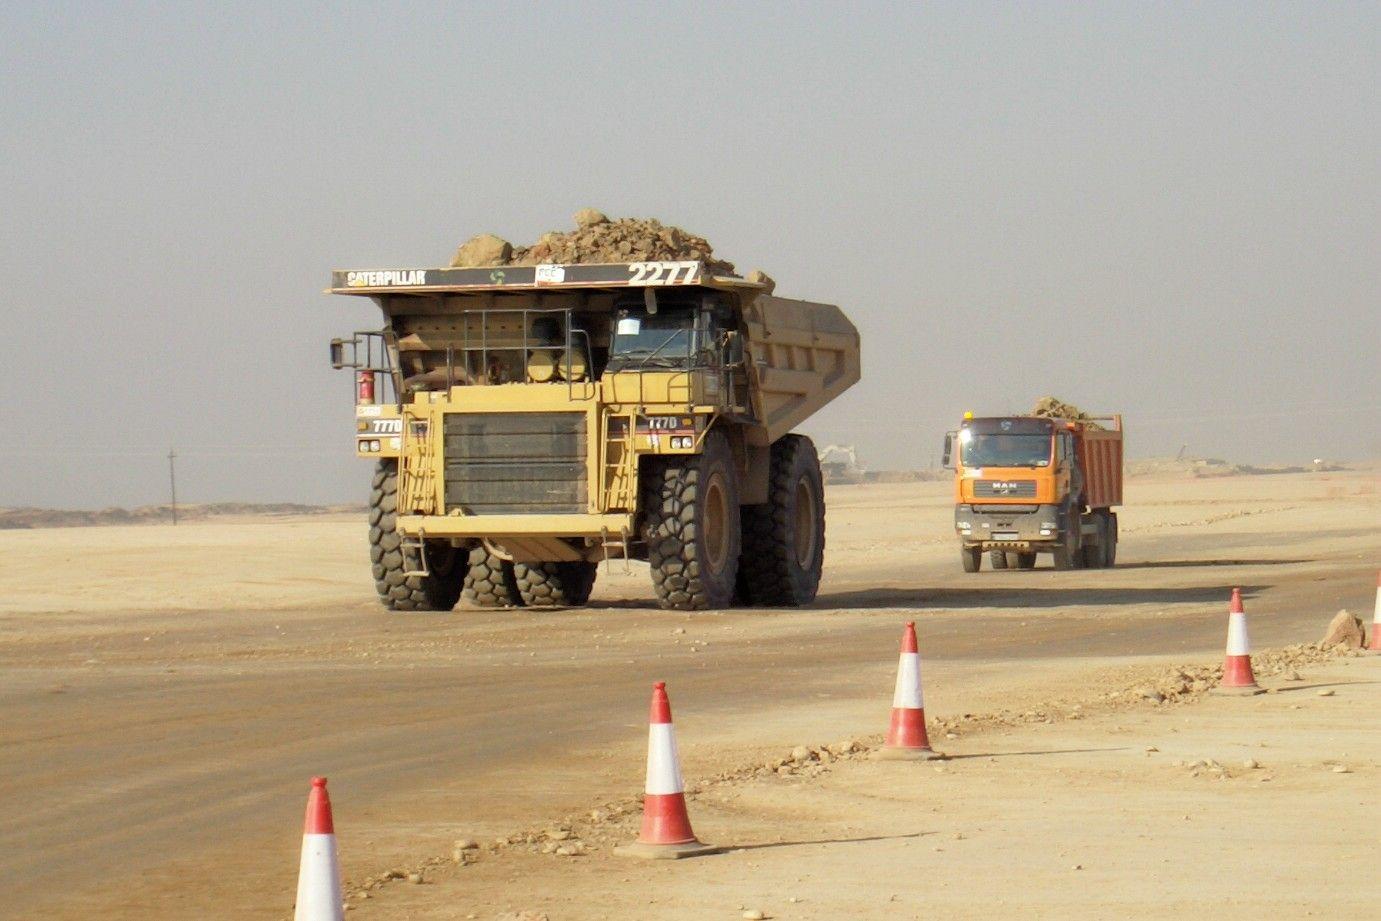 Filecaterpillar 777diijpg dump trucks trucks truck